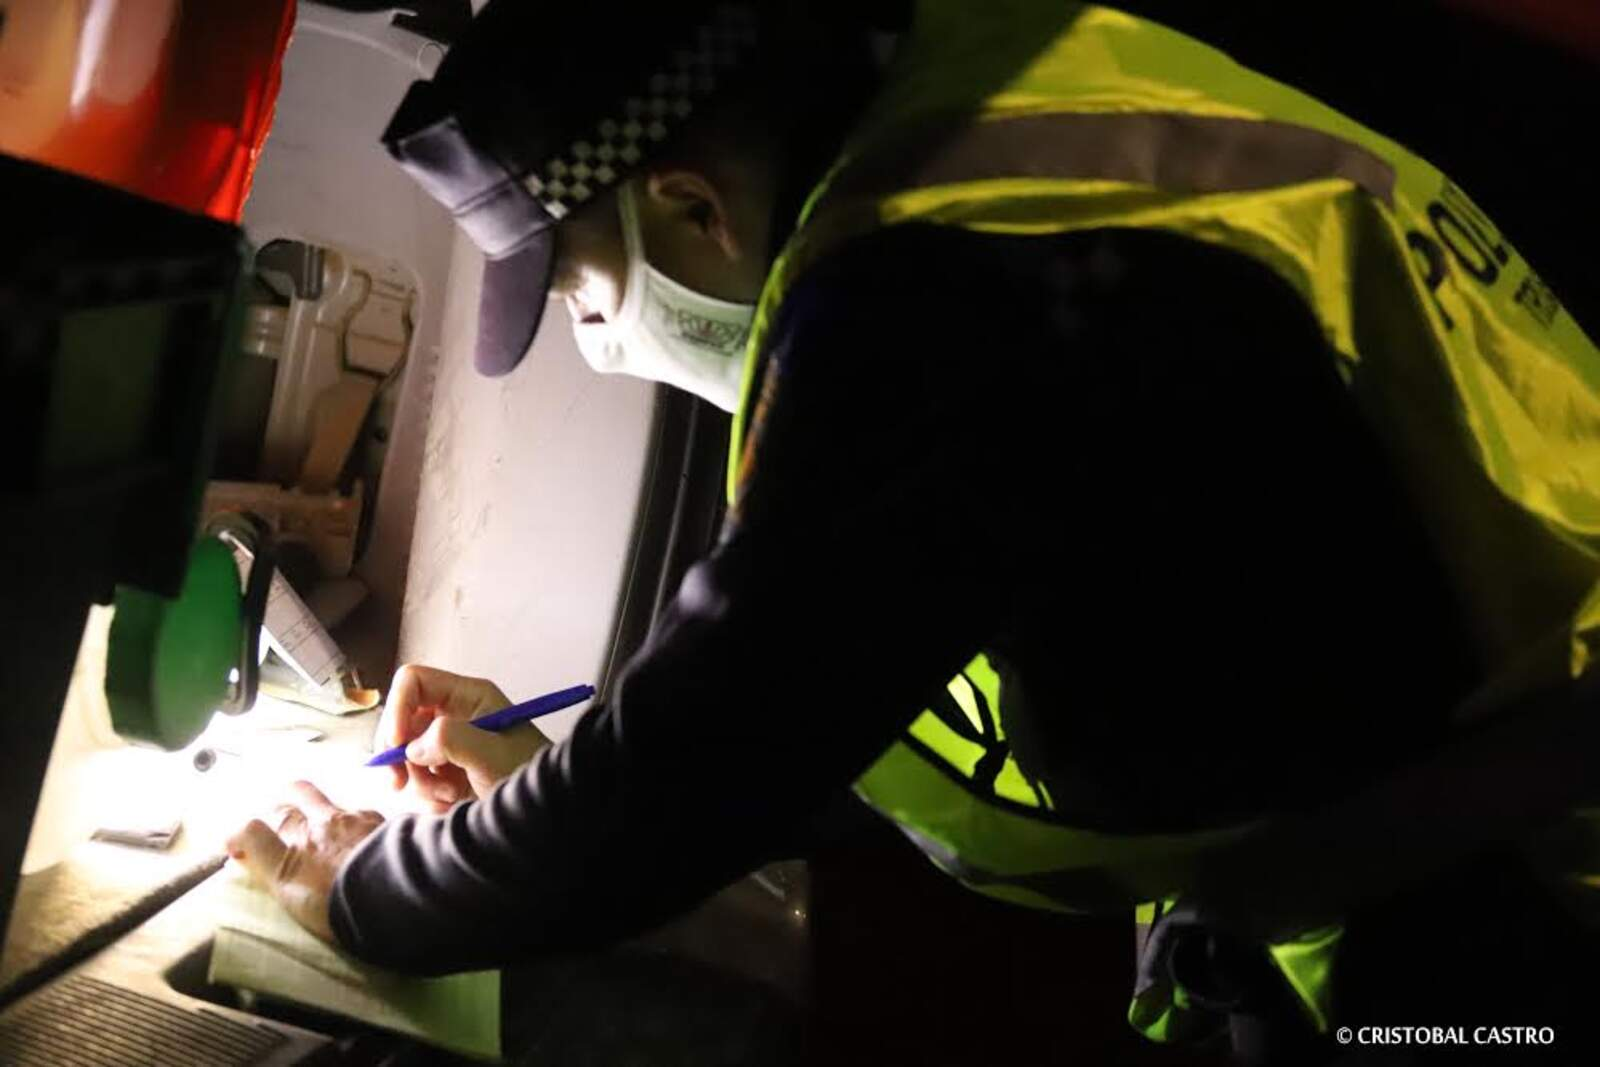 Un agent de la Policia Municipal interposant una denúncia